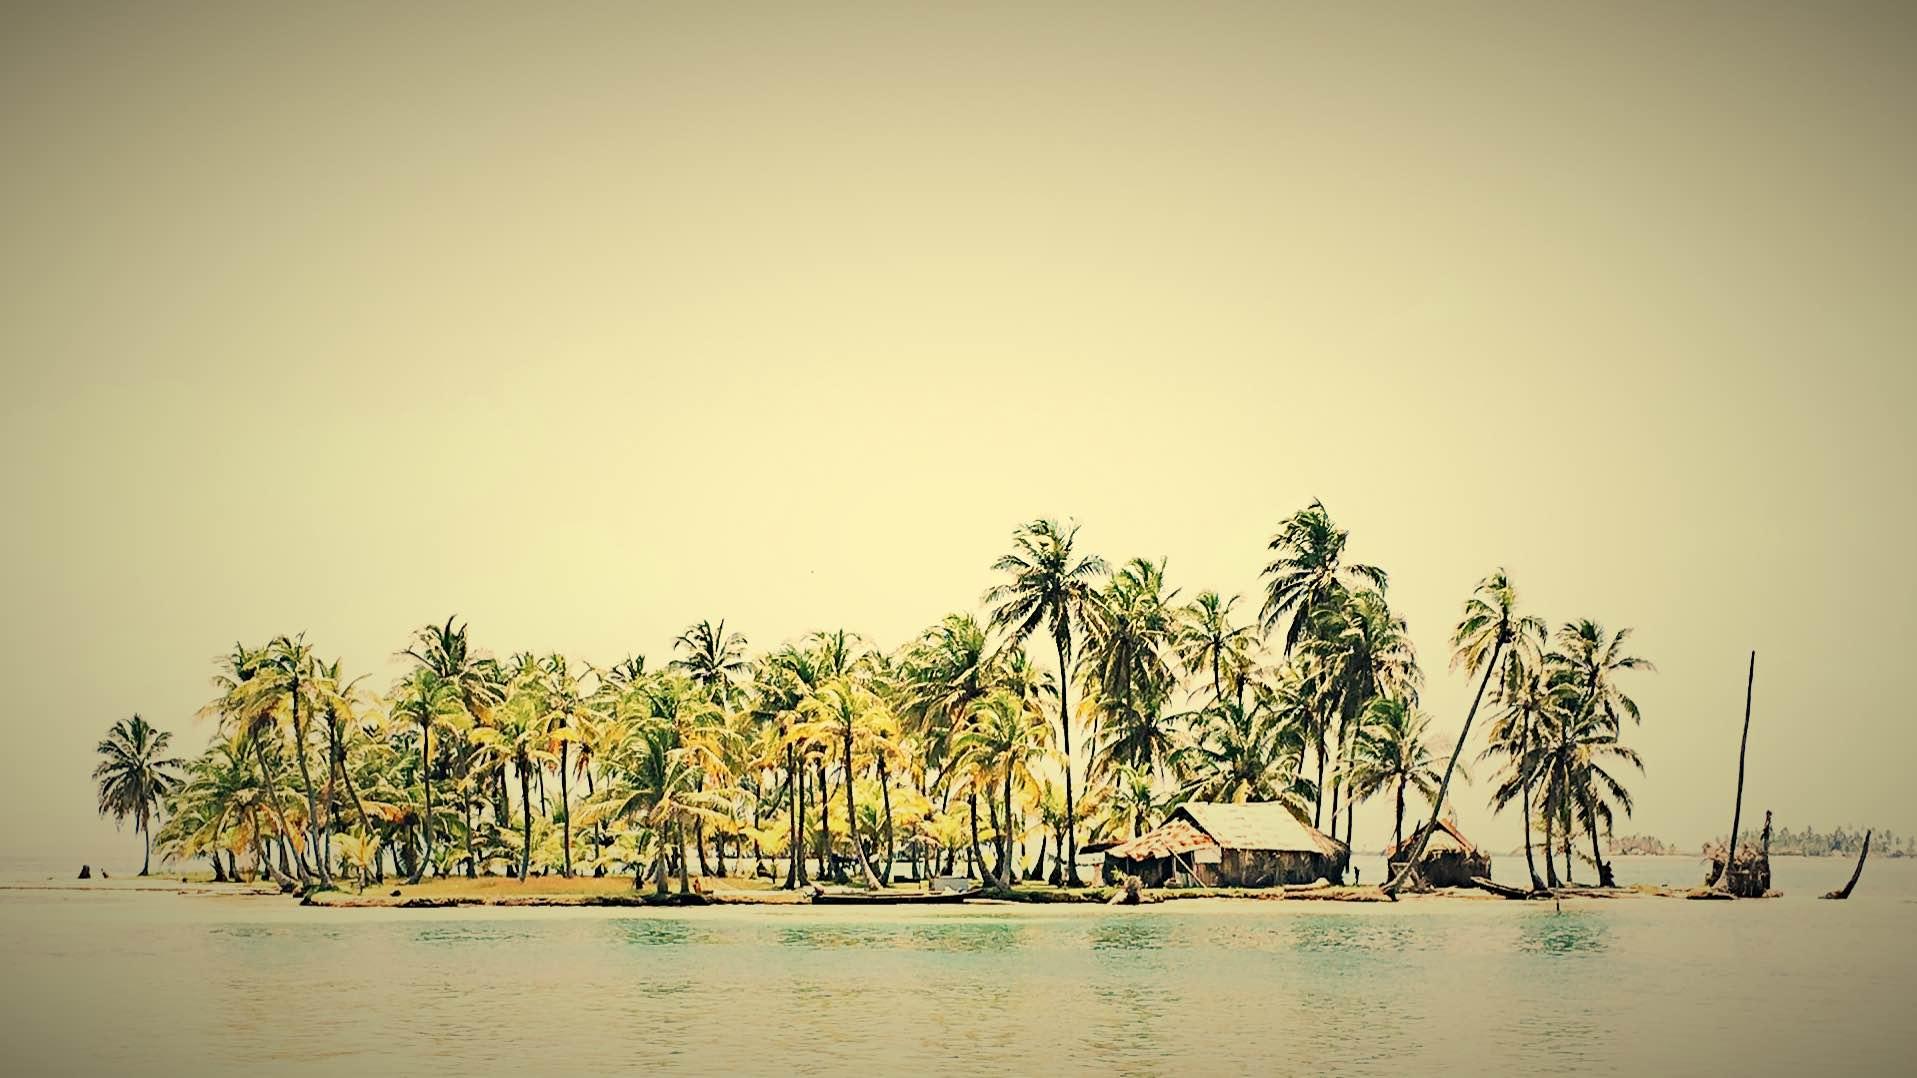 philippine-island_Fotor